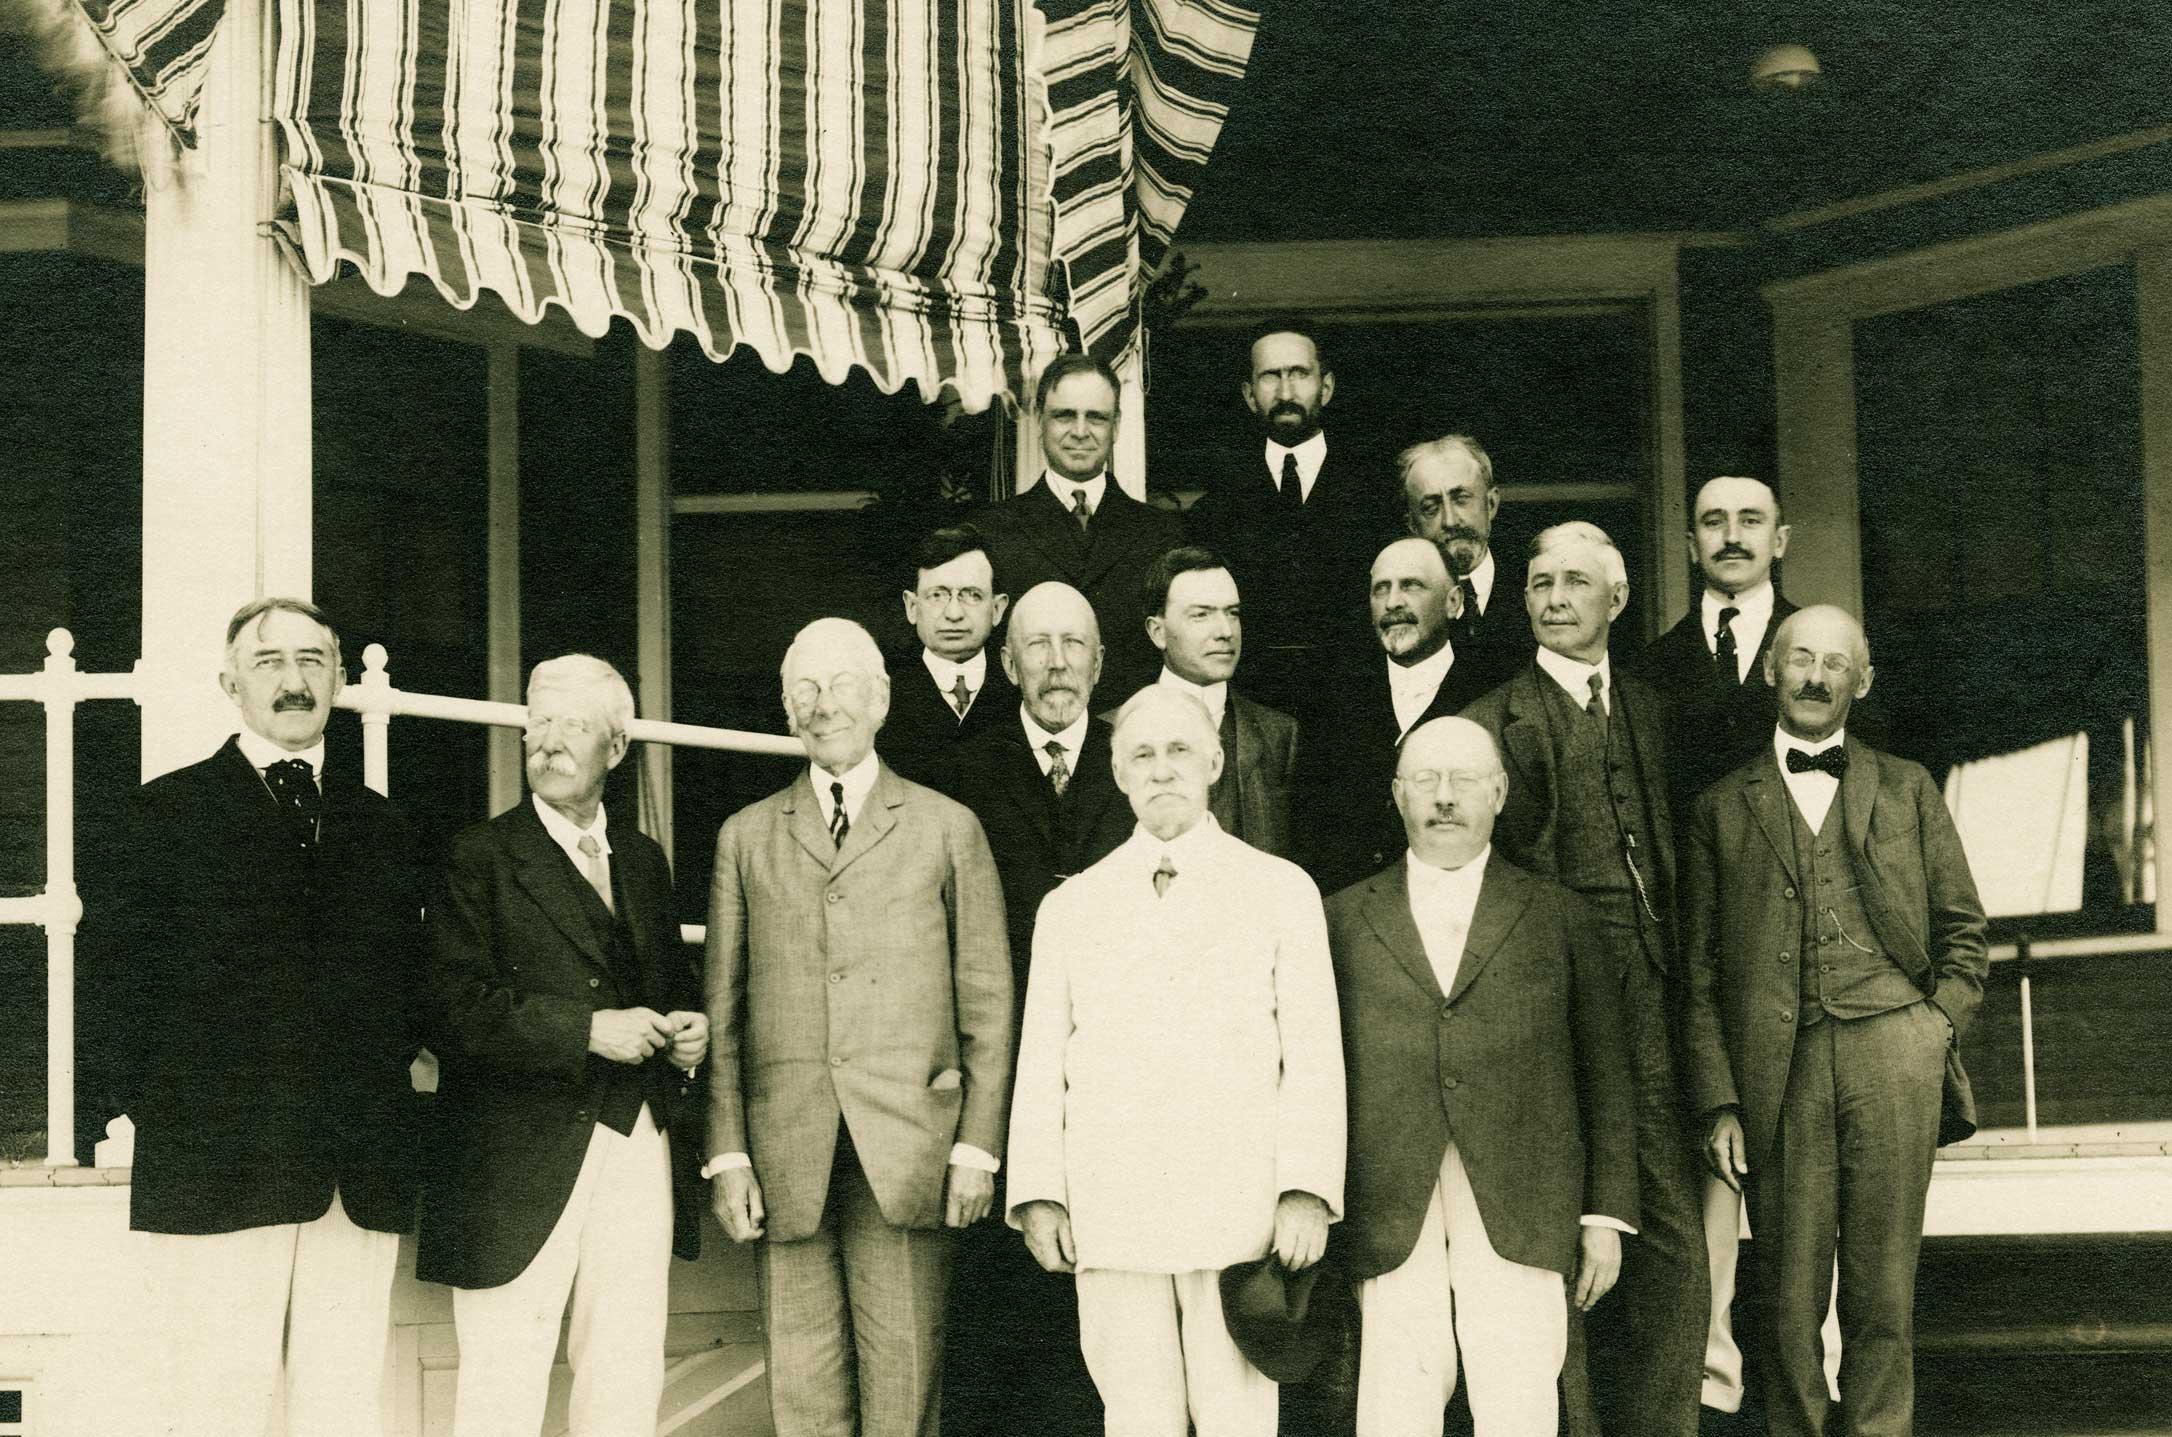 The General Education Board, a precursor to The Rockefeller Foundation.